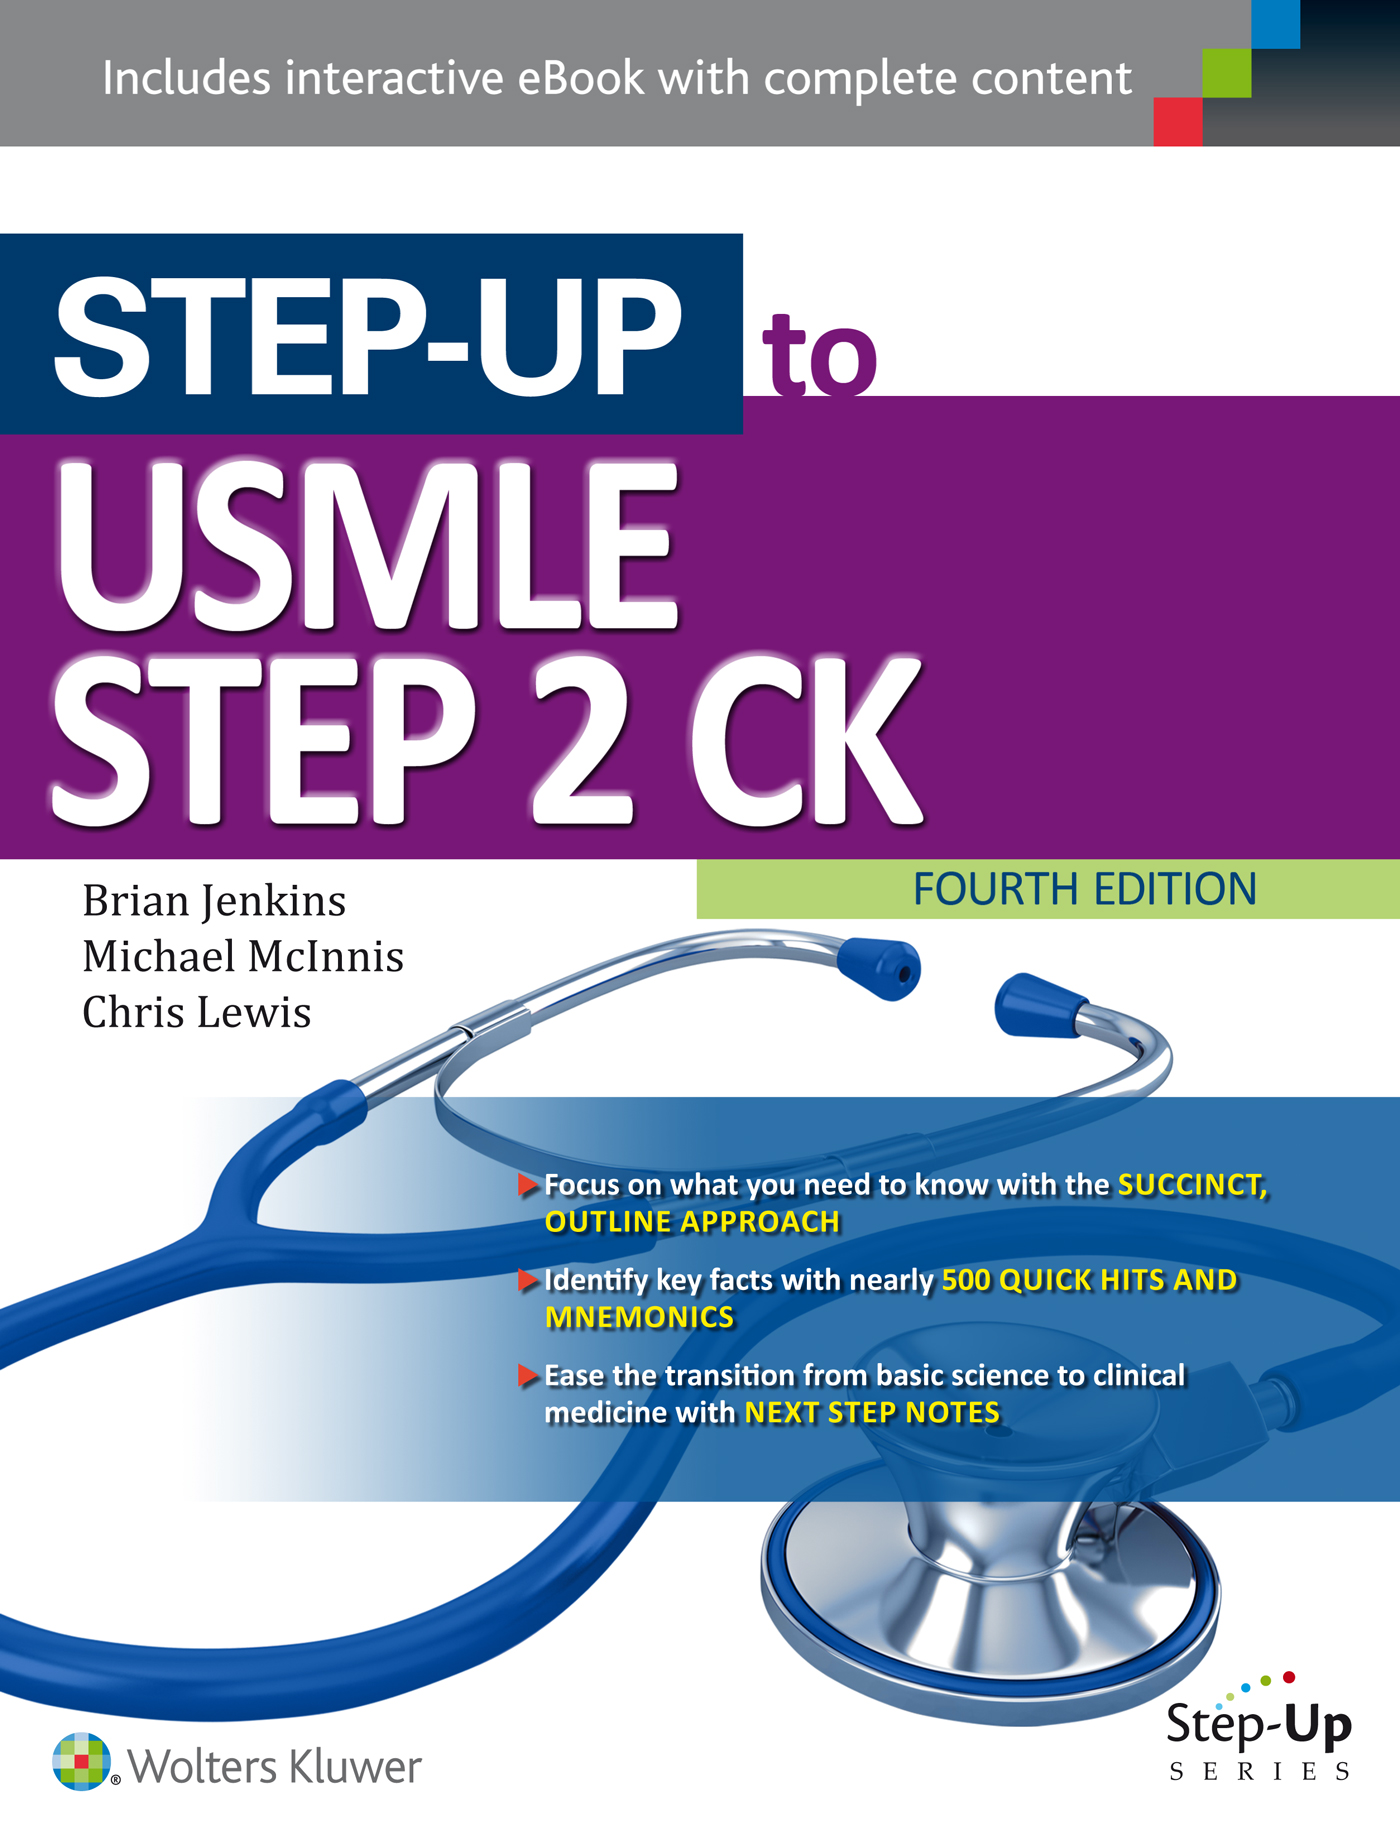 Step-Up to USMLE Step 2 CK